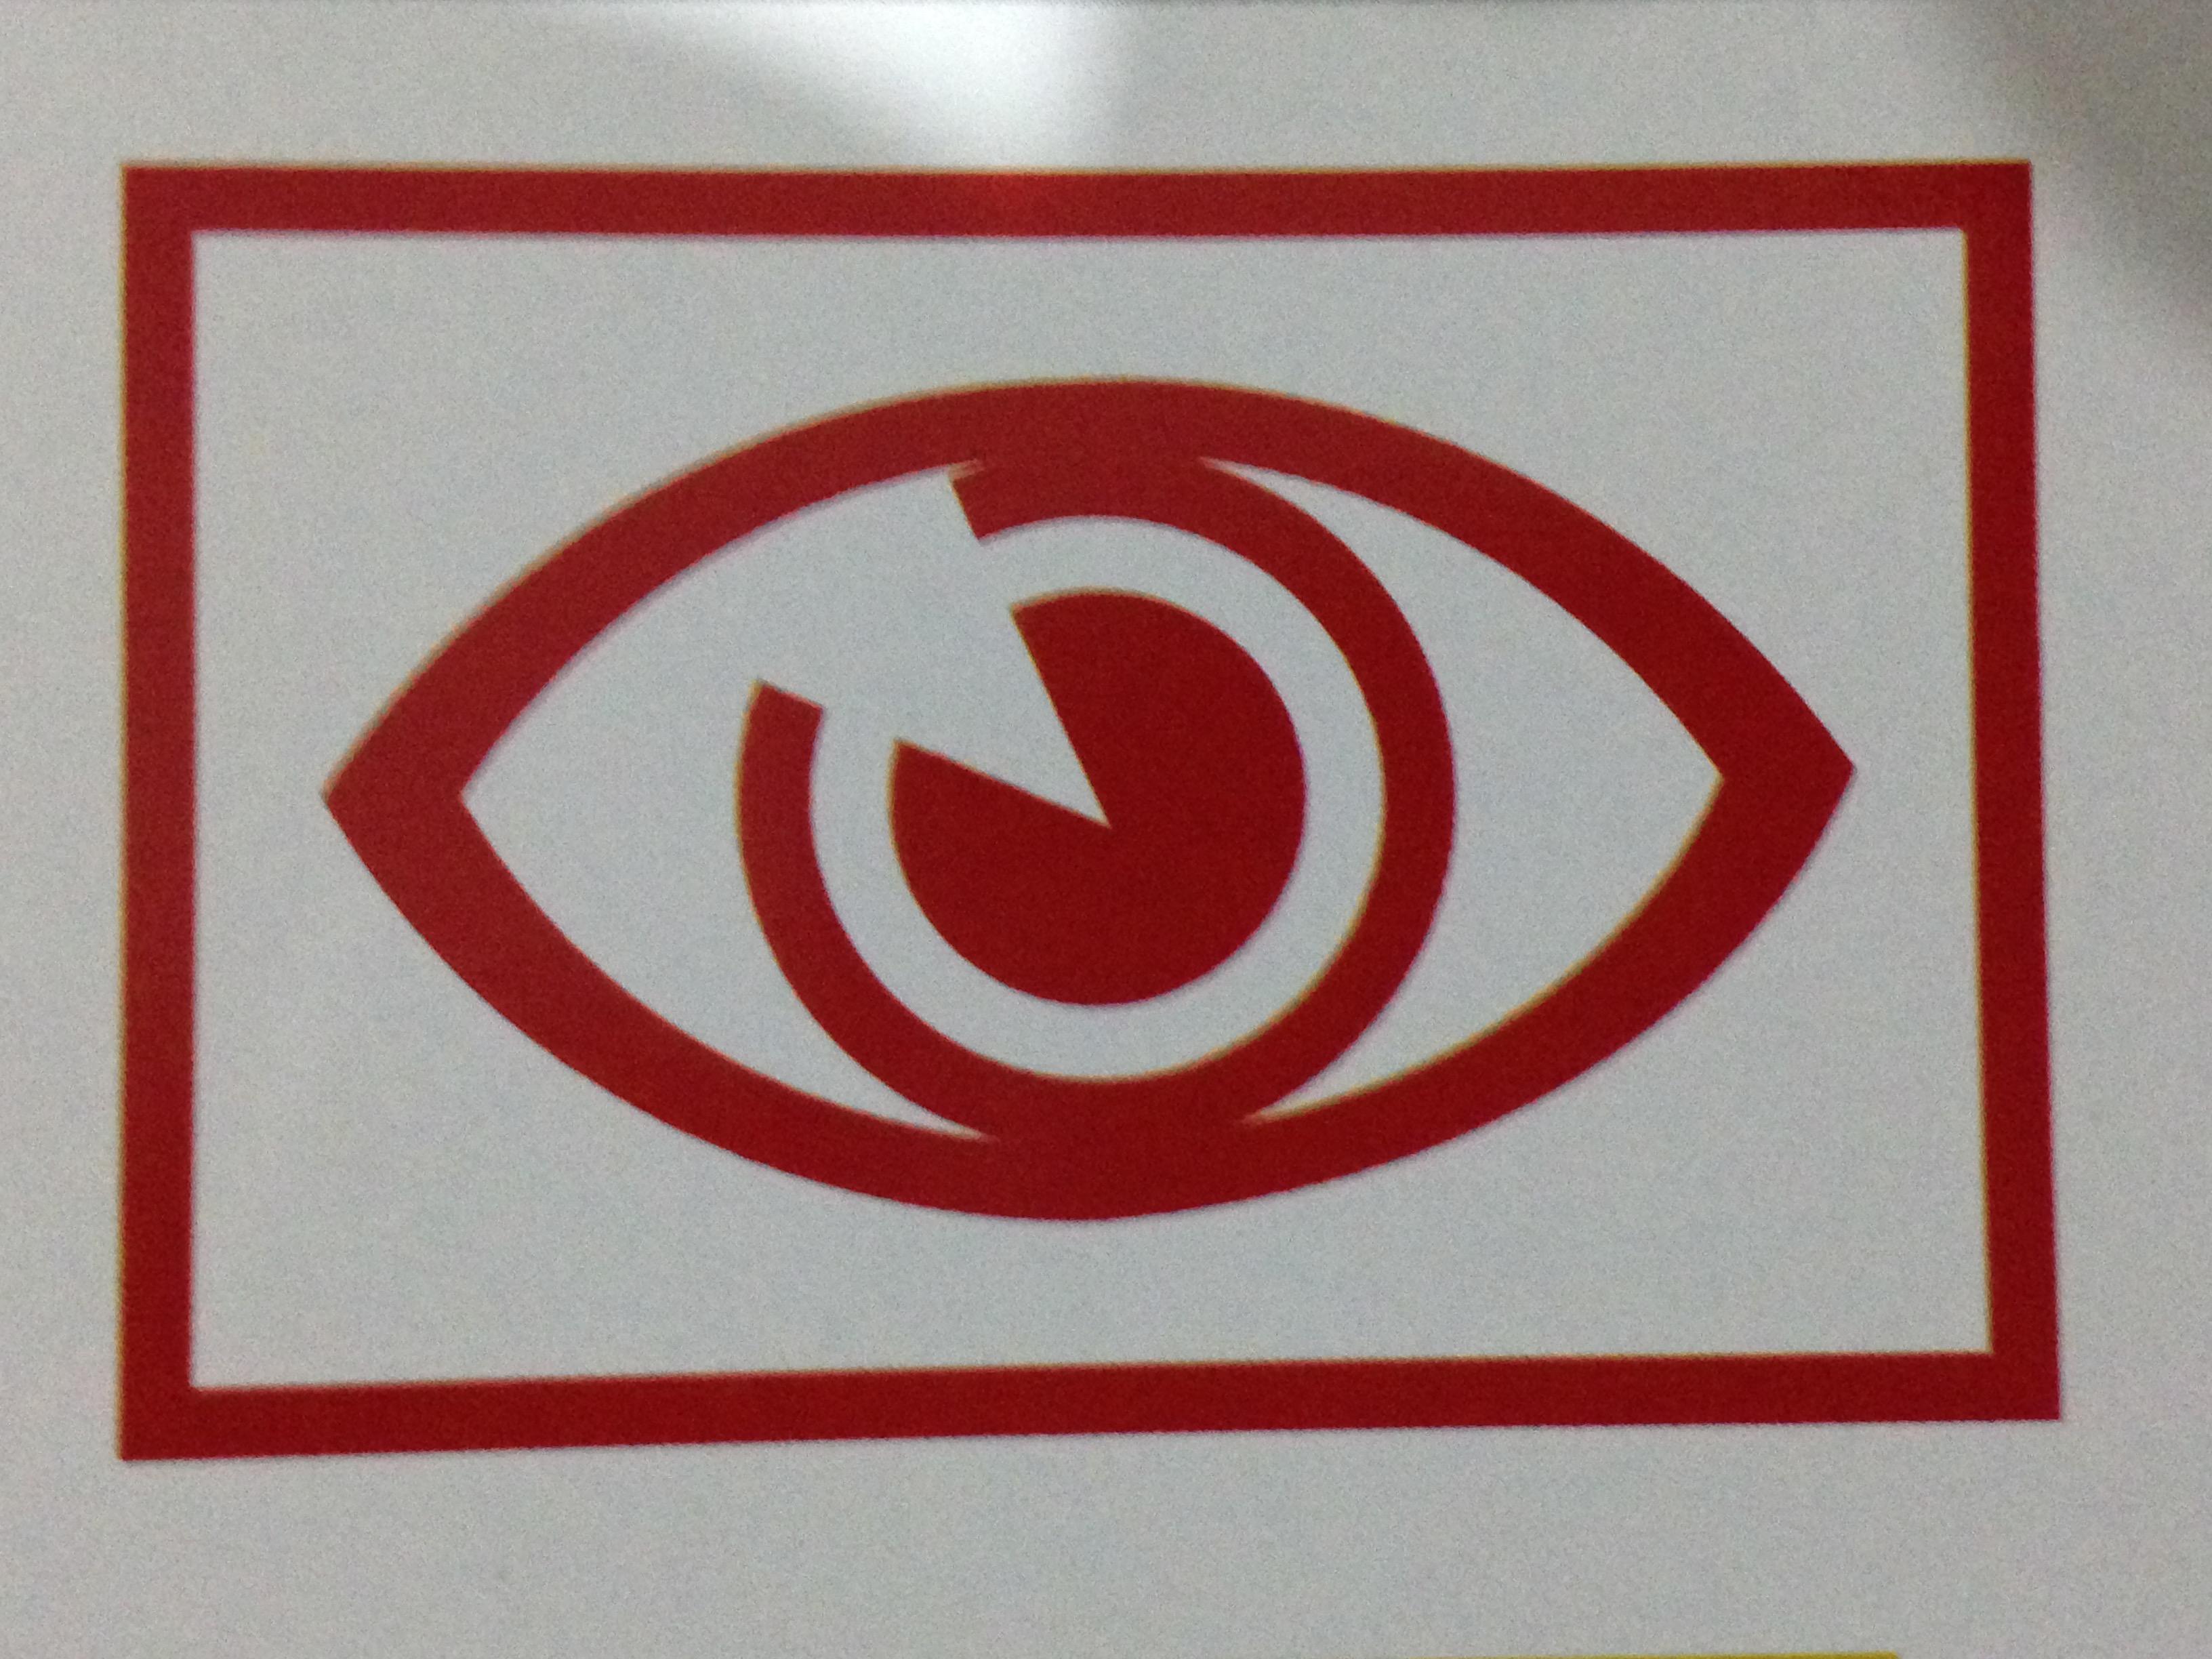 Soham Eye Clinic